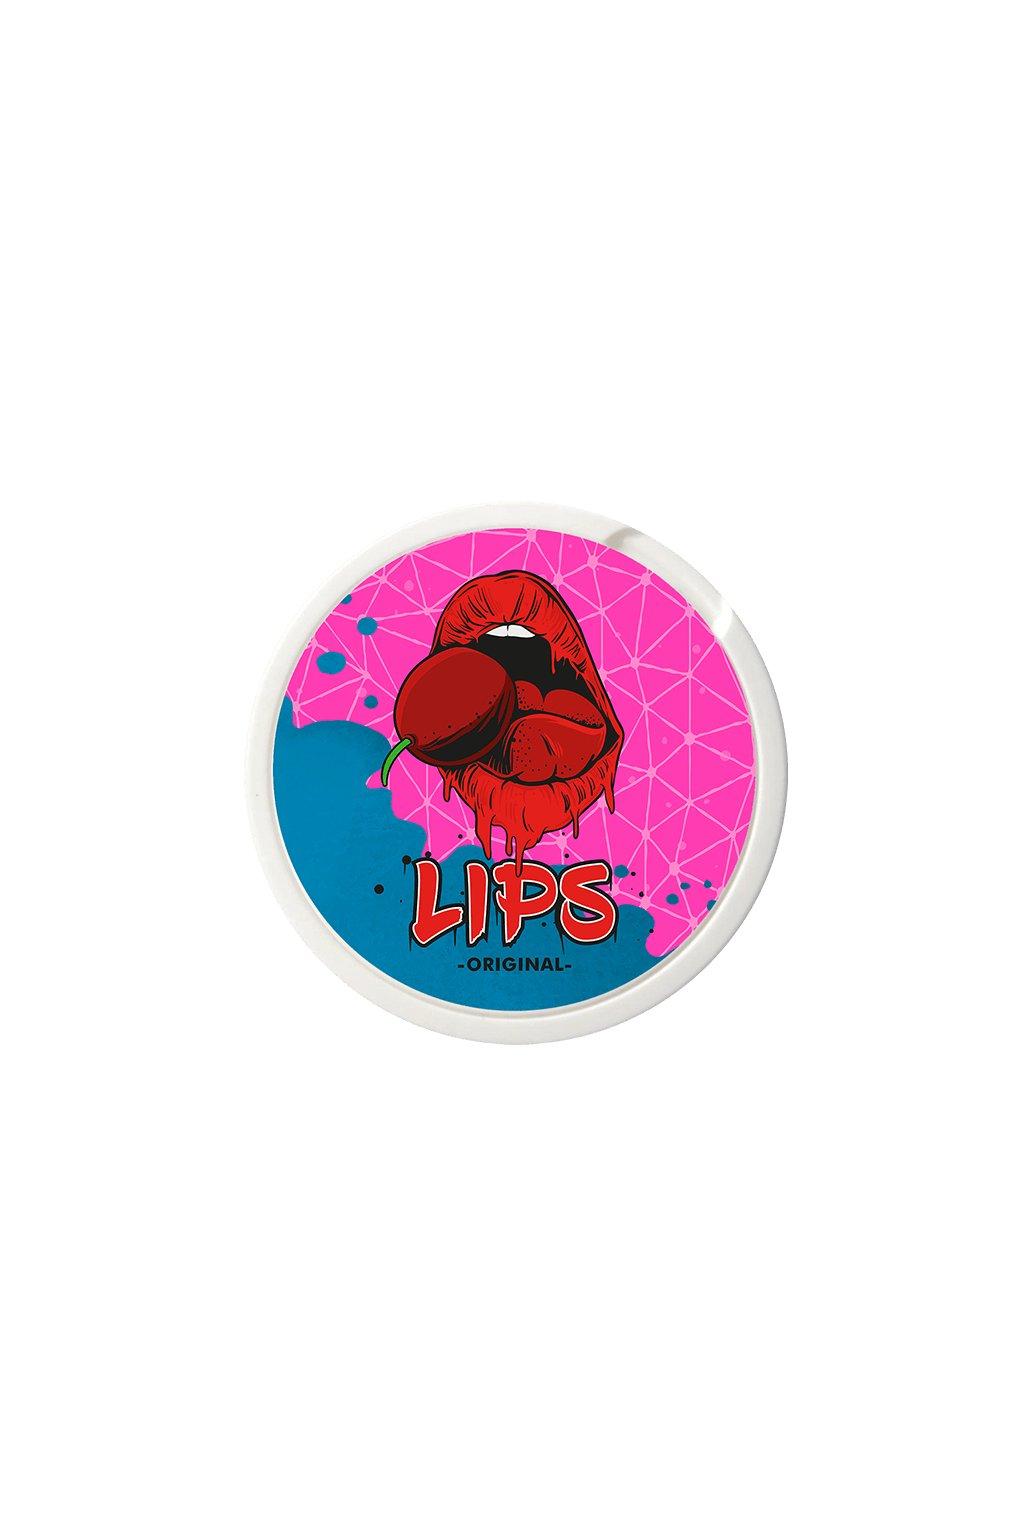 LIPS Original